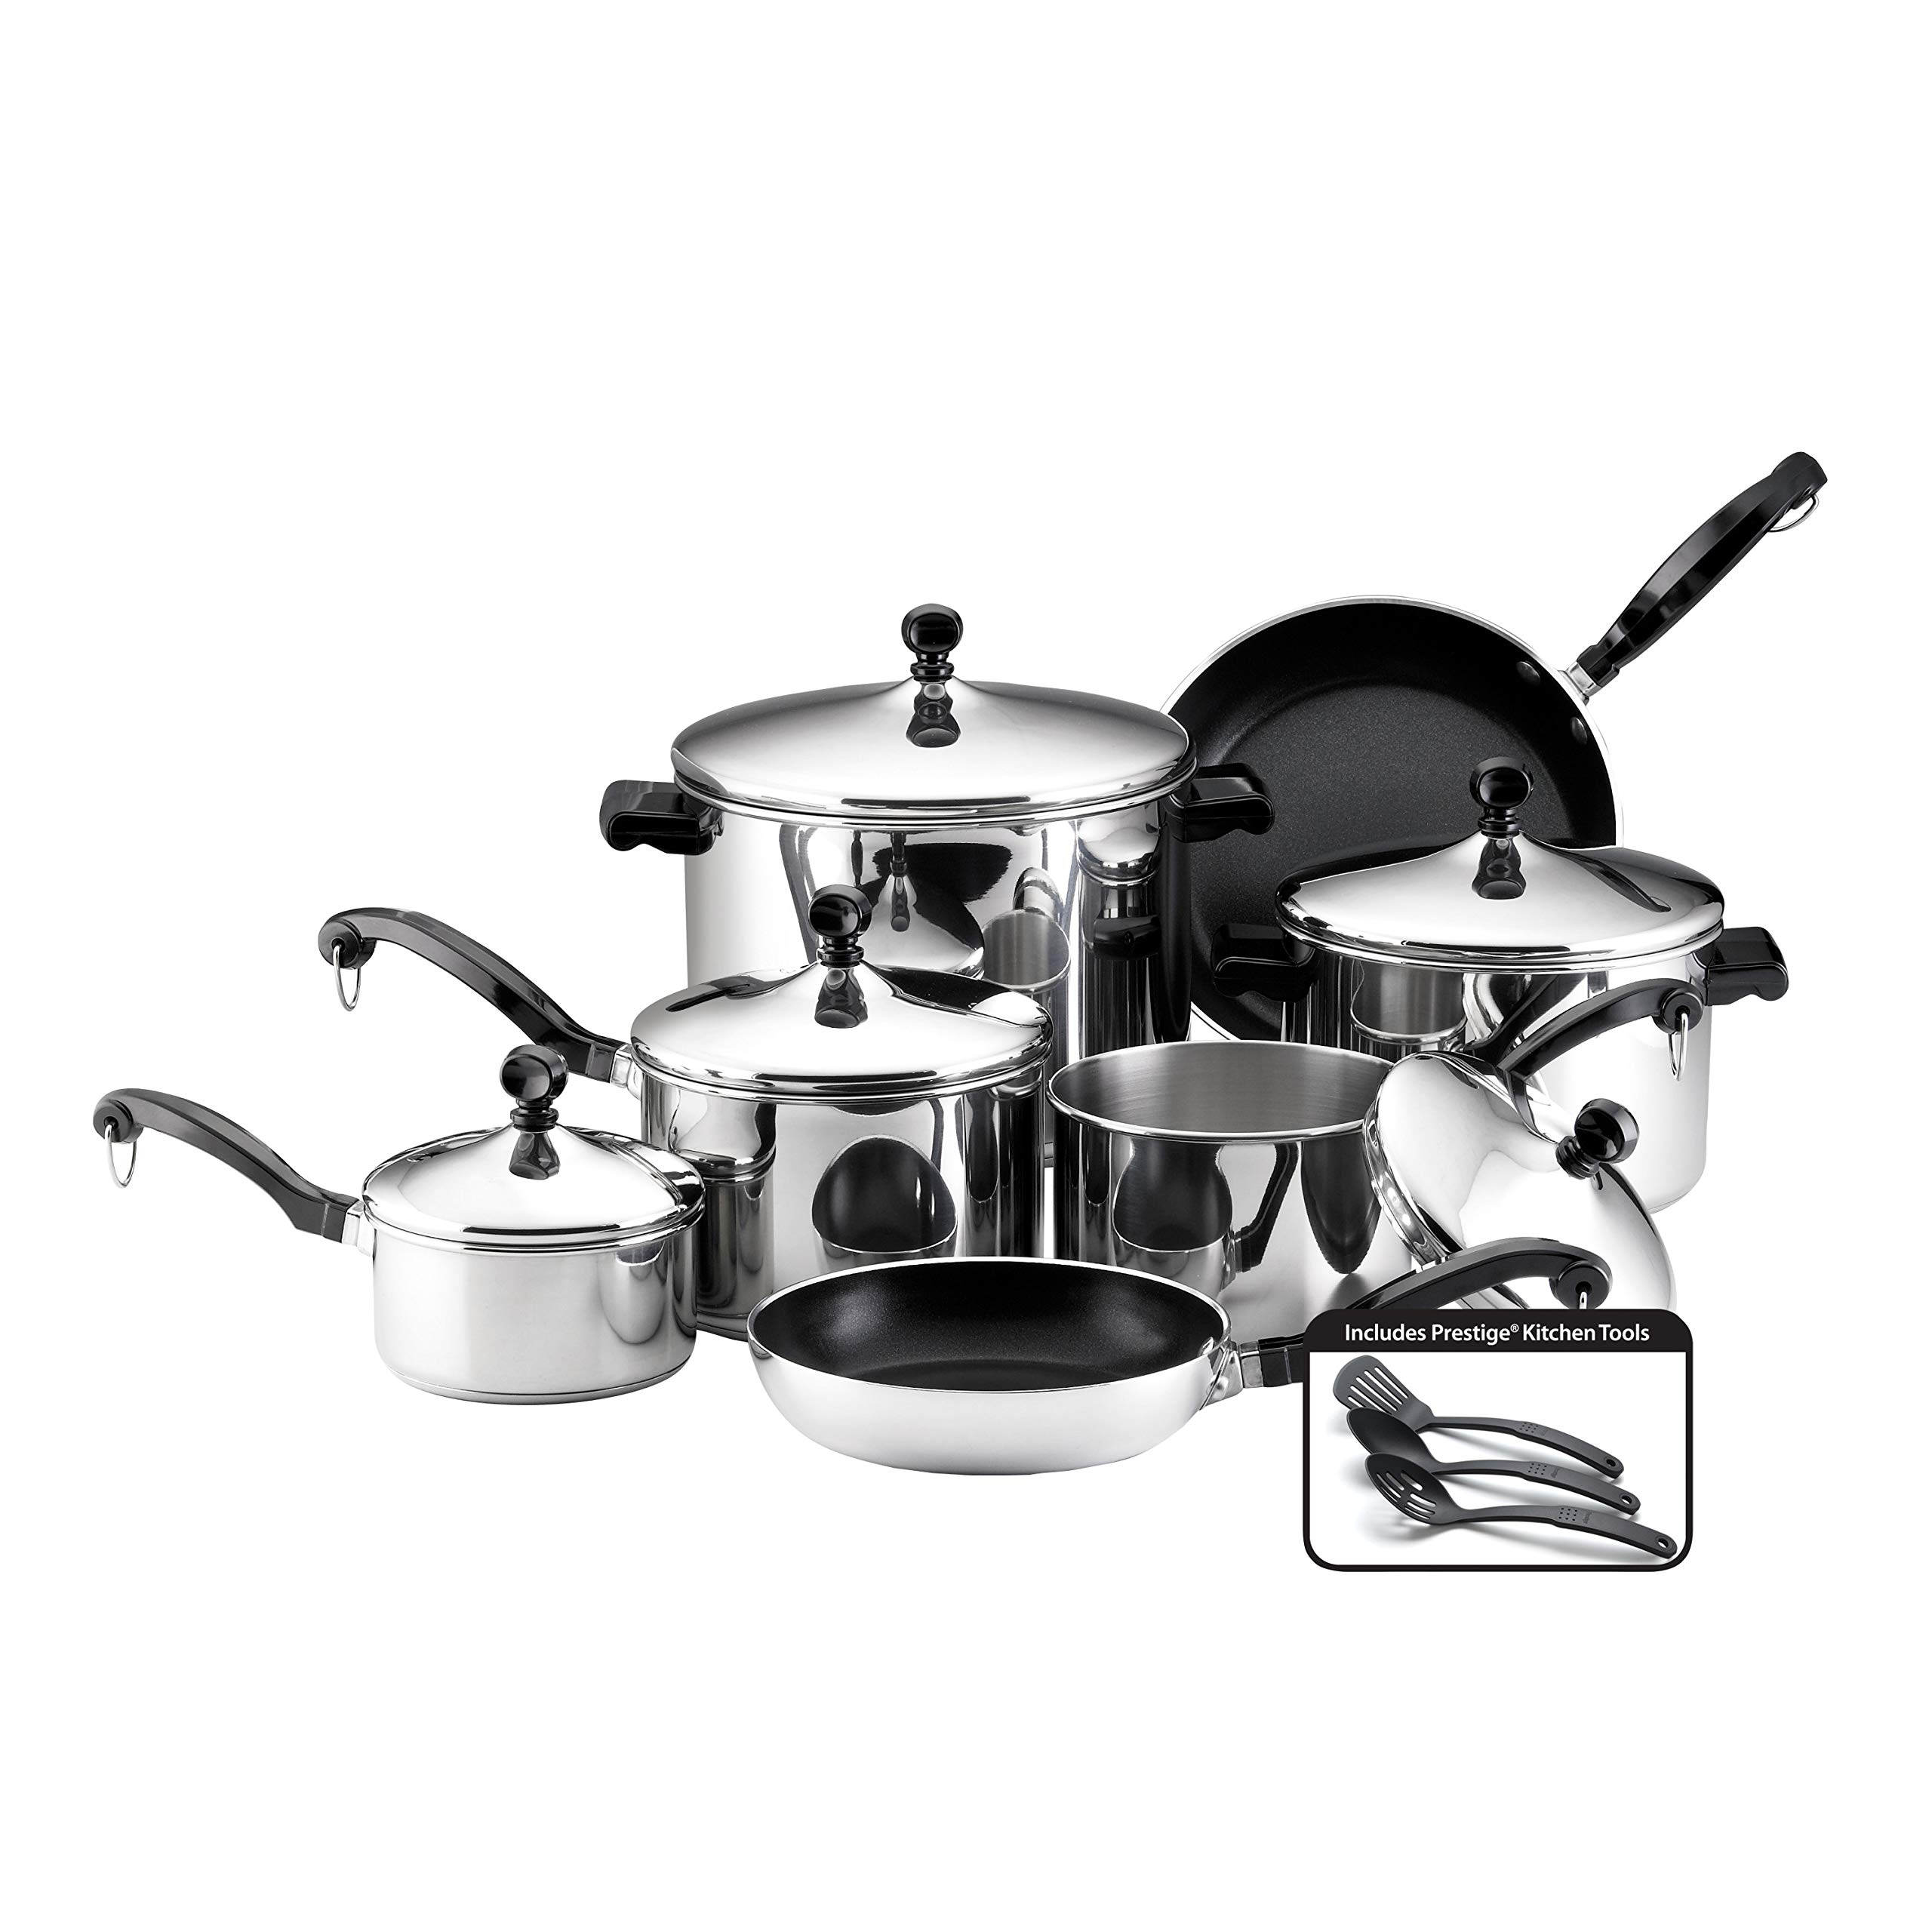 Farberware 50049 Stainless Steel Cookware Set, 15-Piece